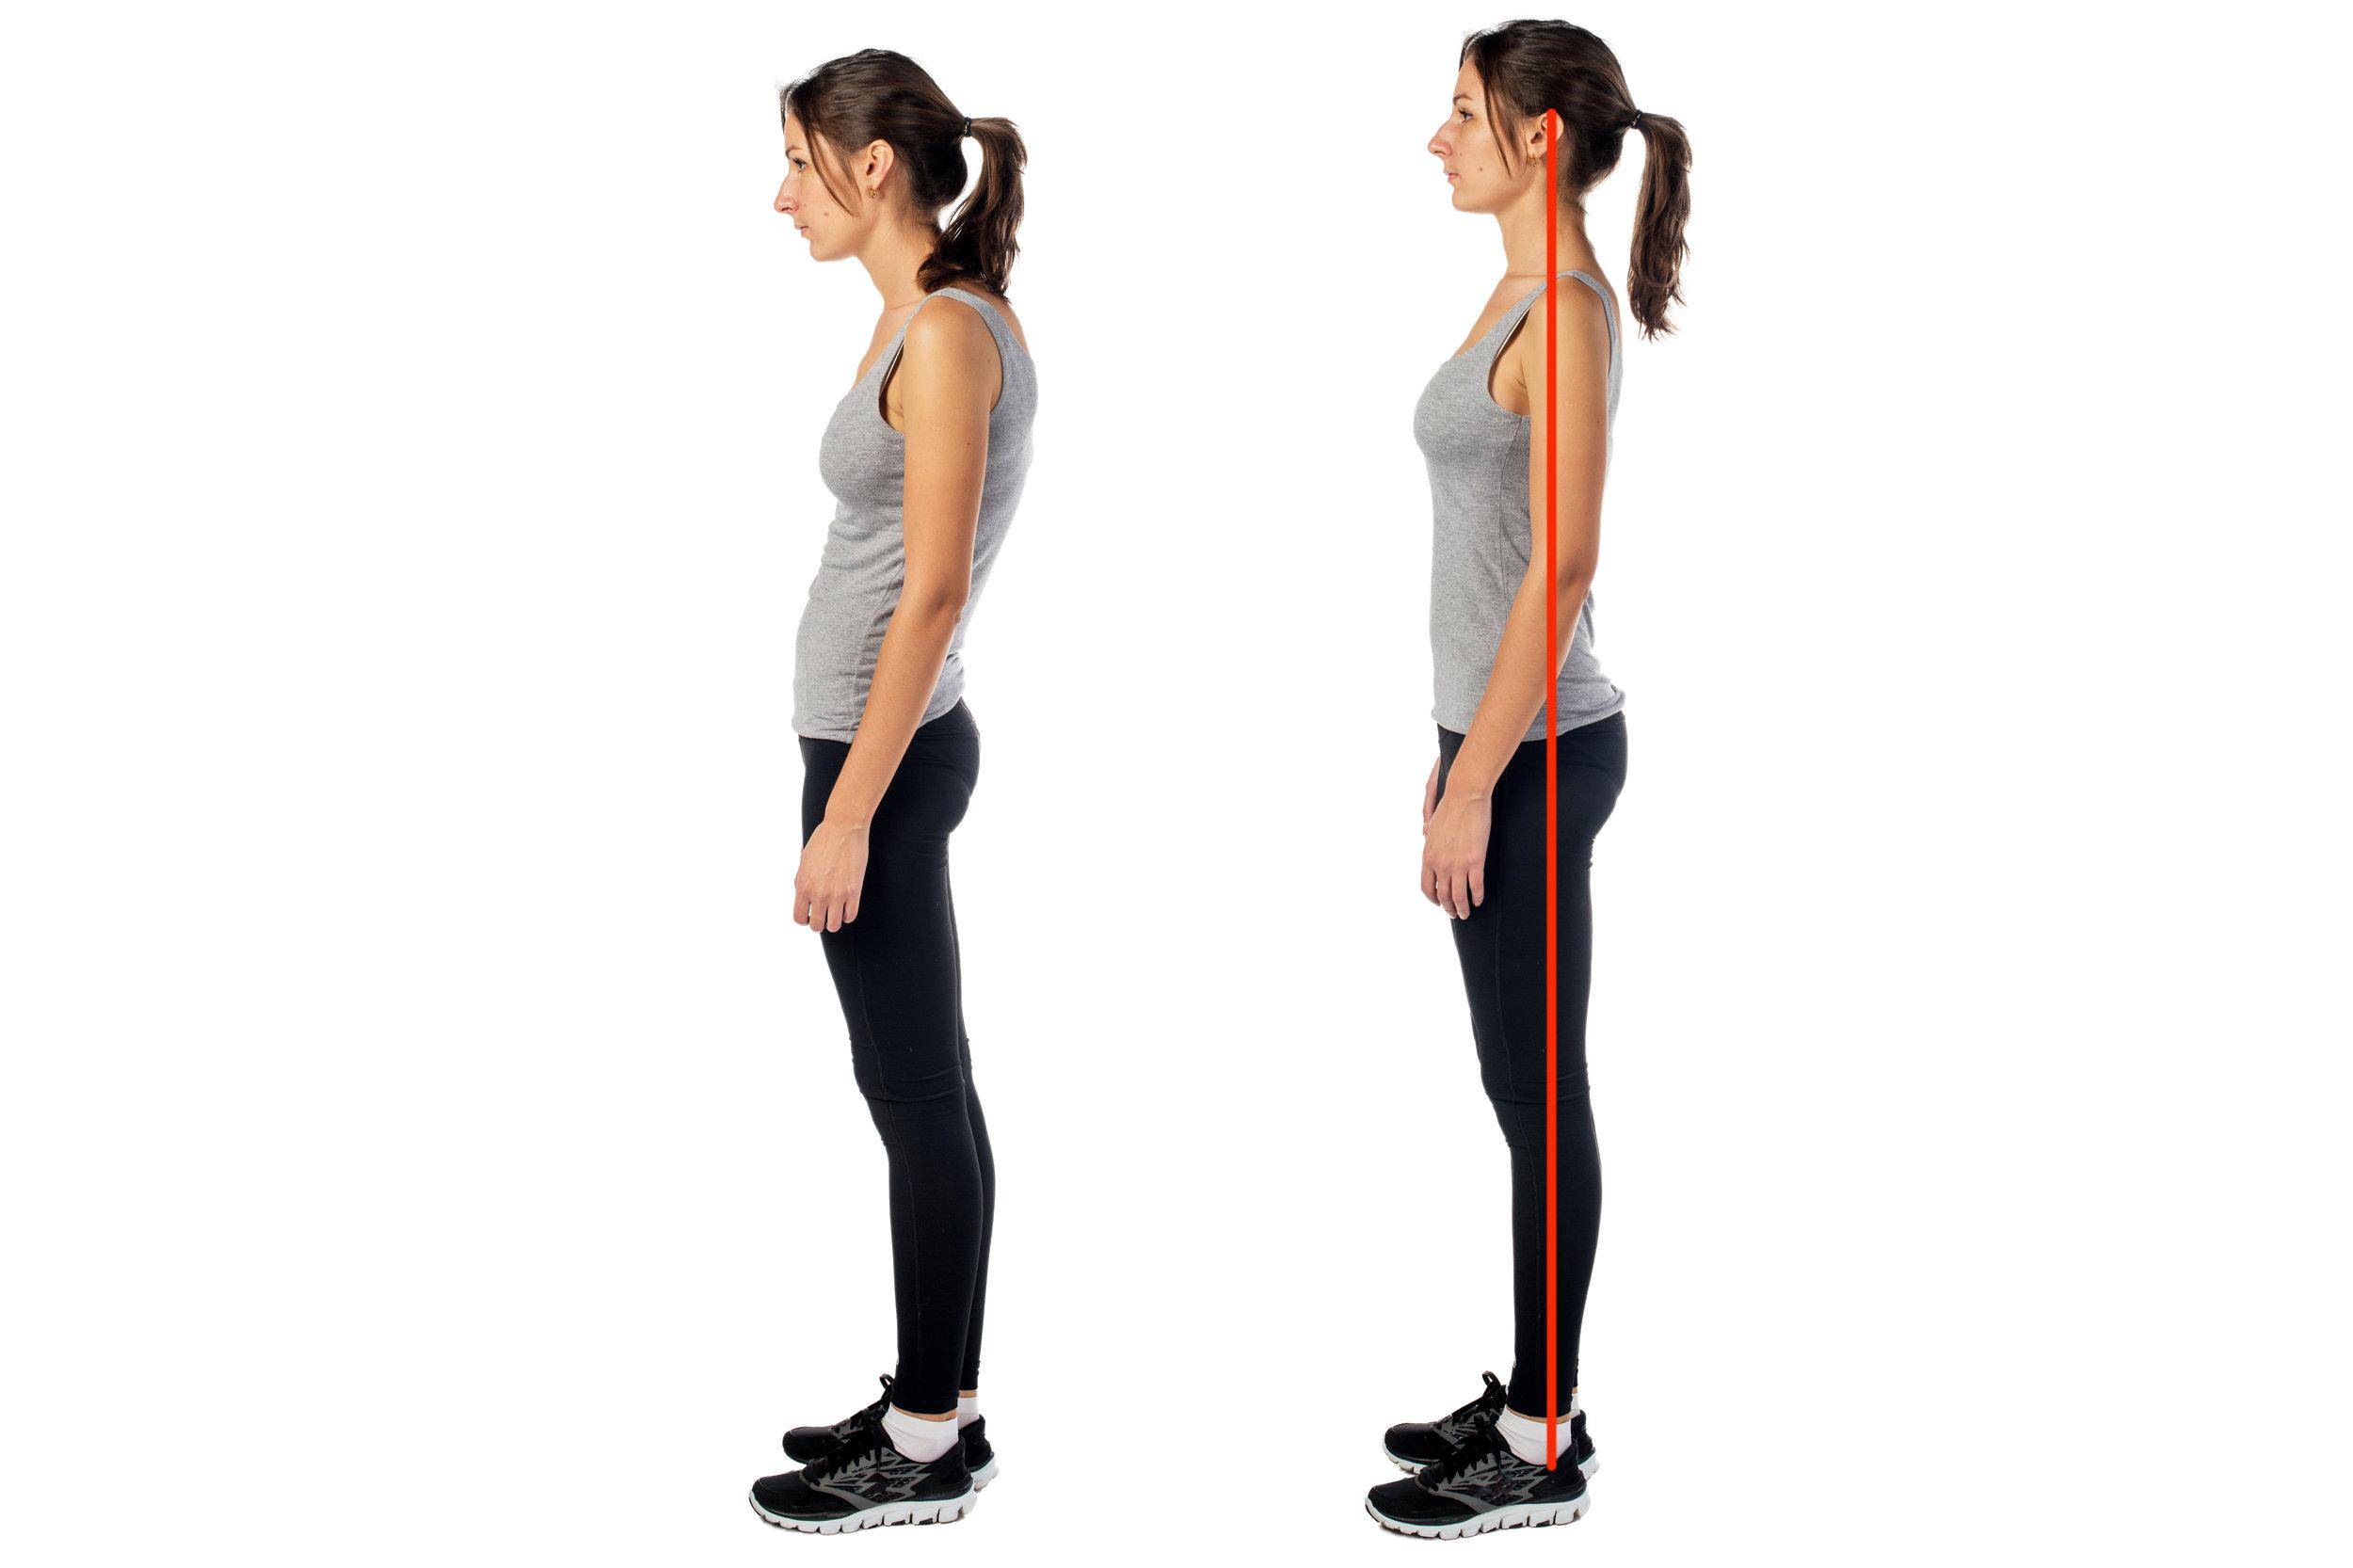 female posture - mom posture / good posture women